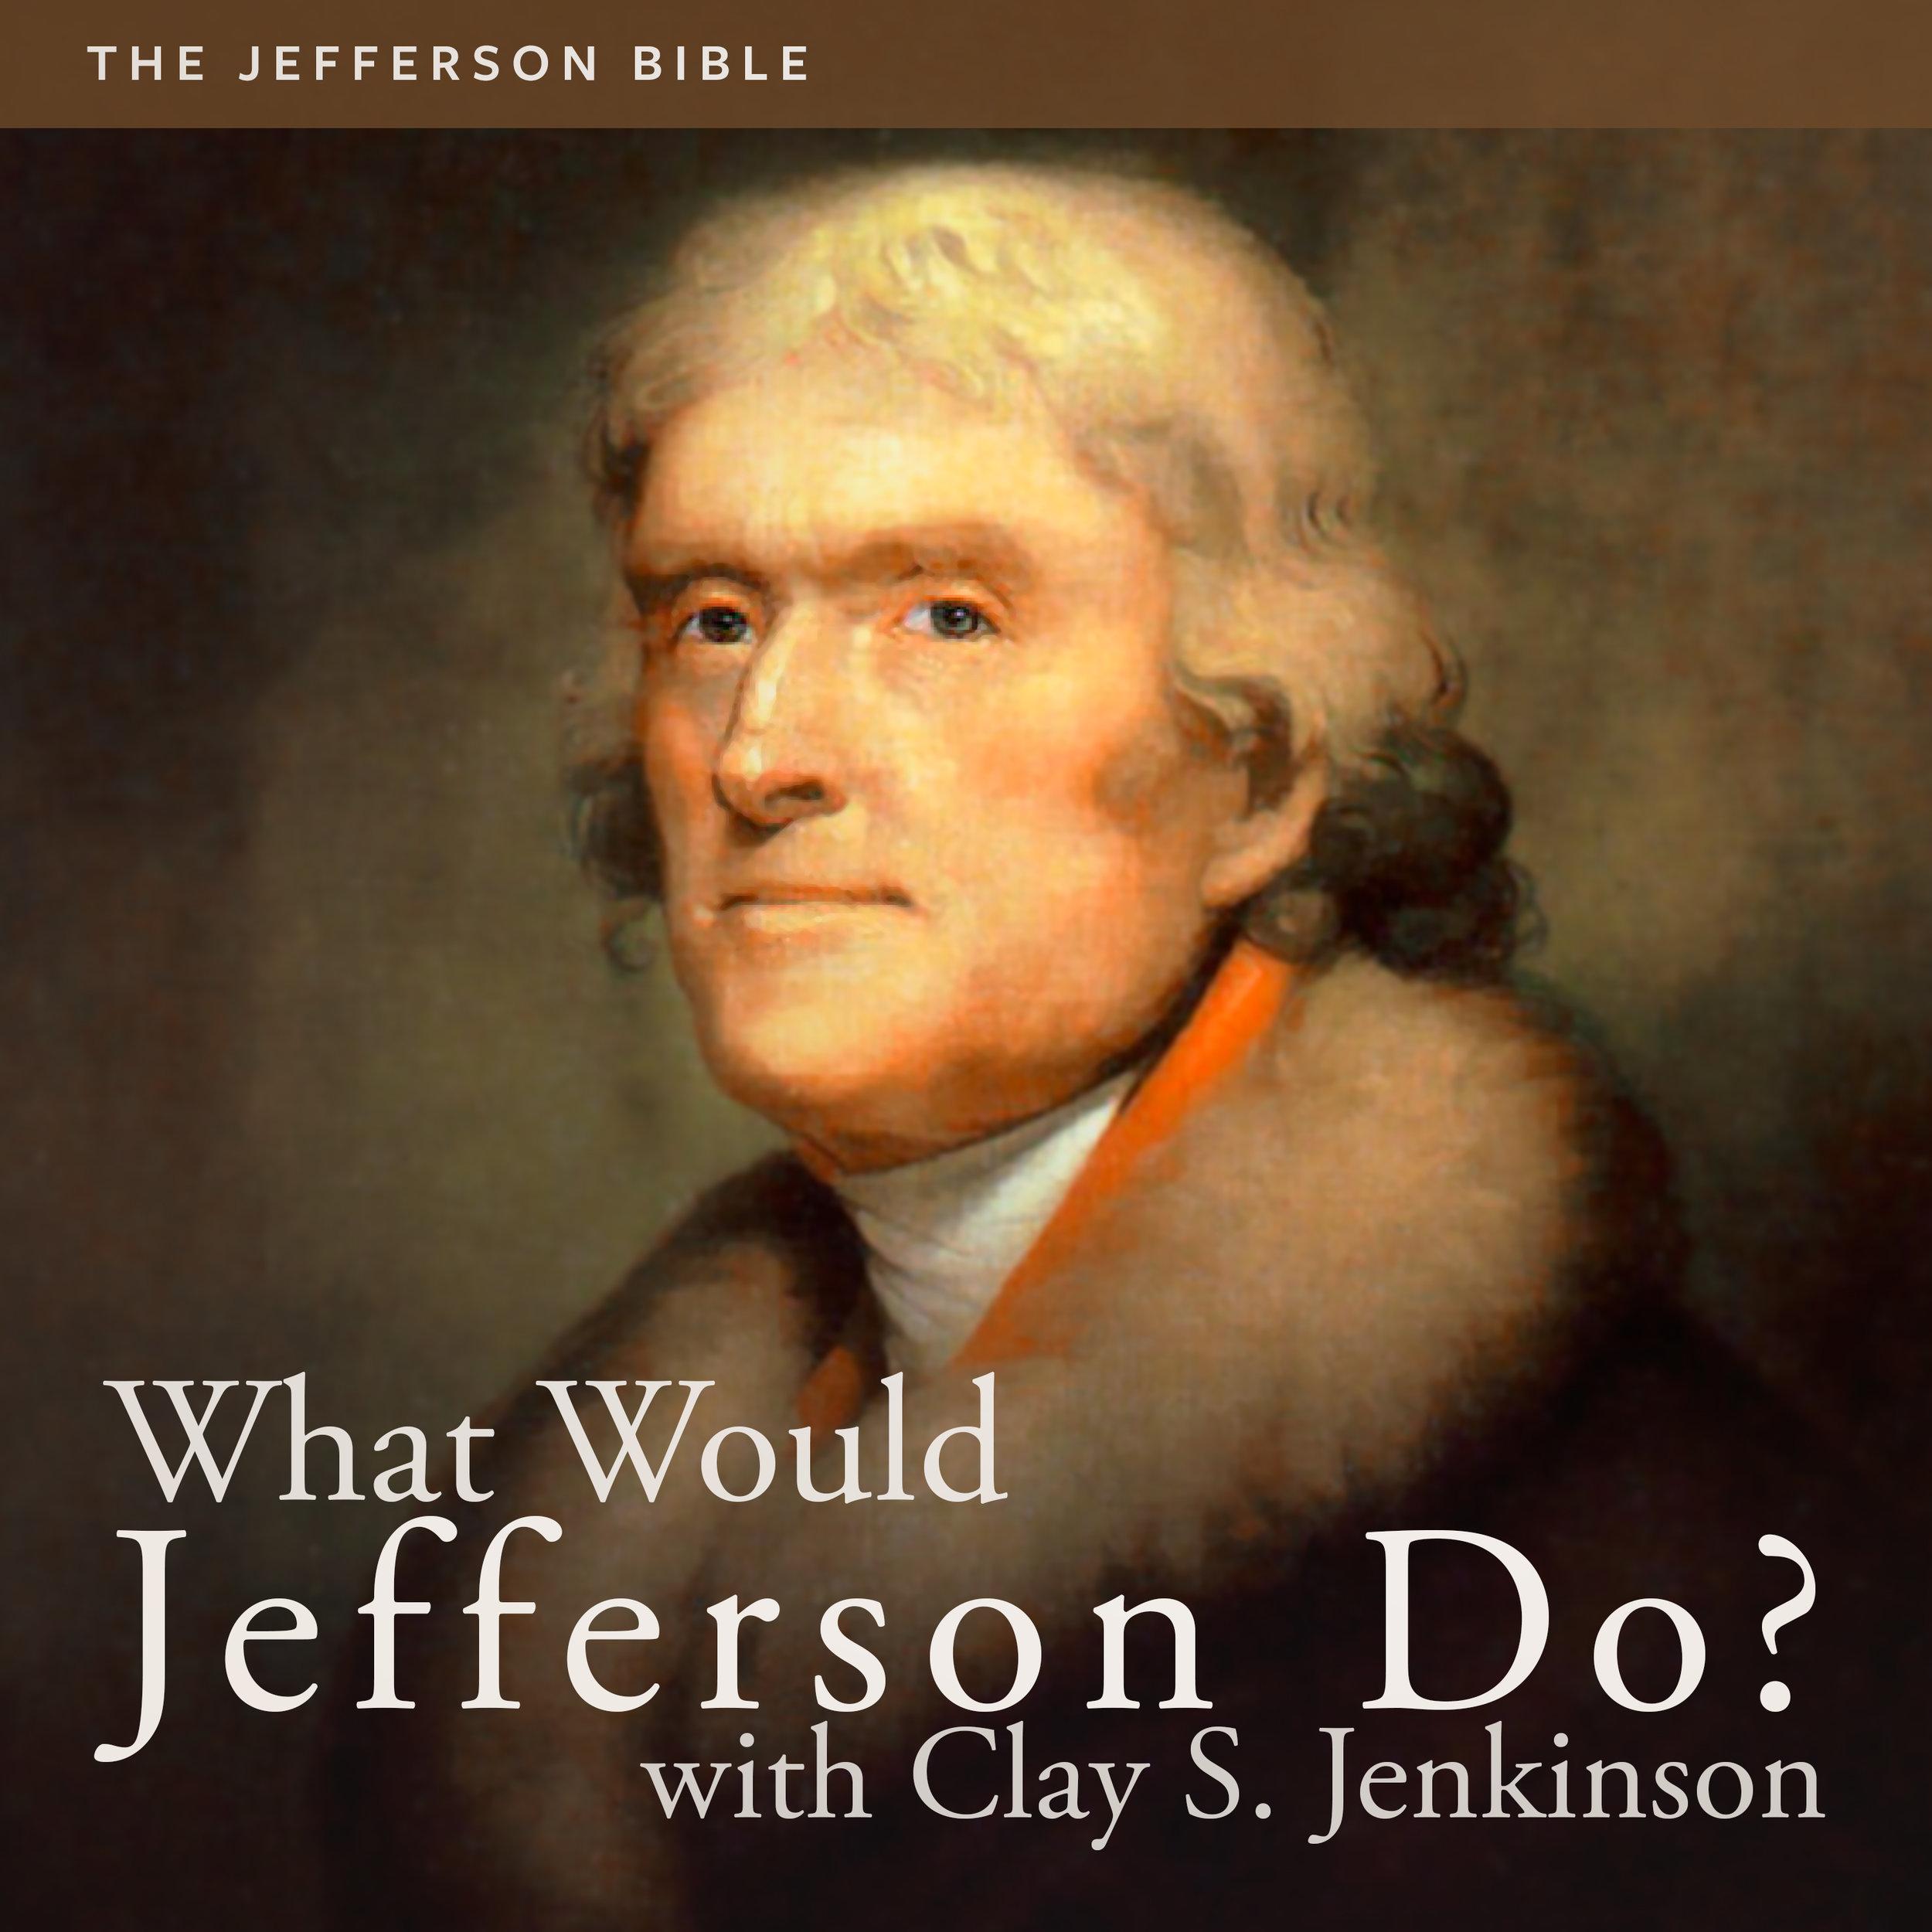 WWTJD_1334 The Jefferson Bible.jpg